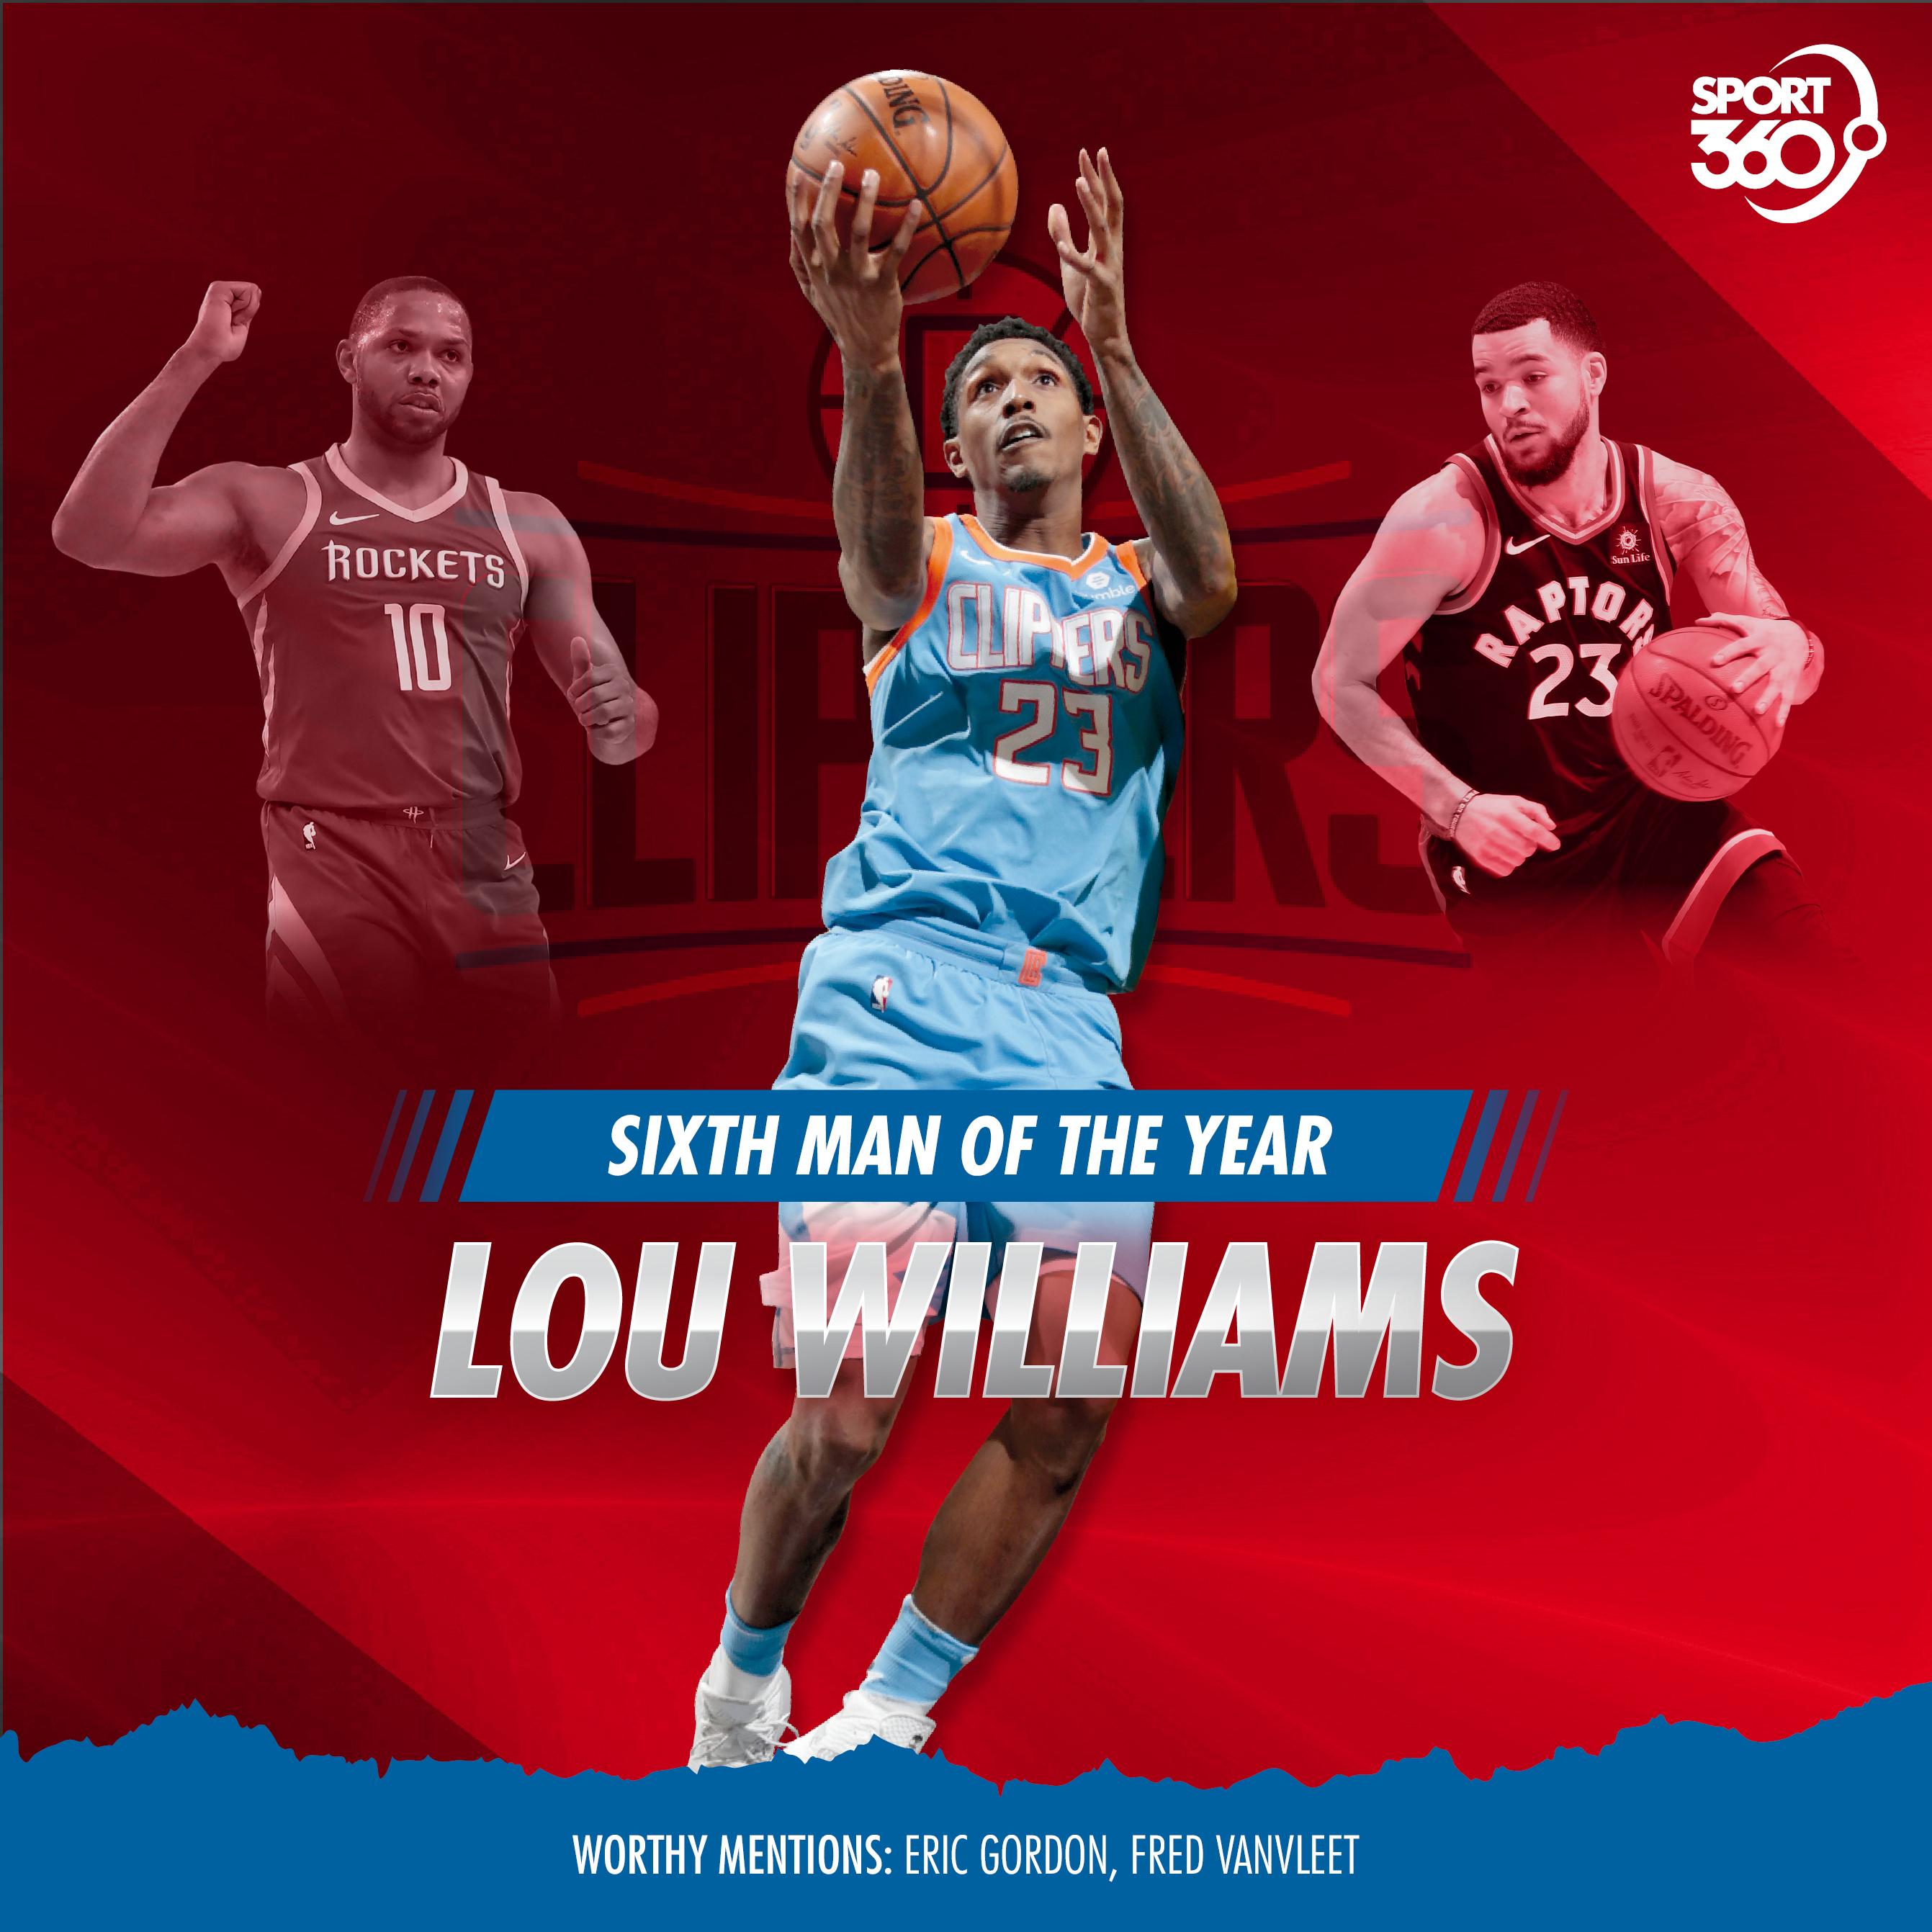 11 06 2018 NBA sixth man-williams